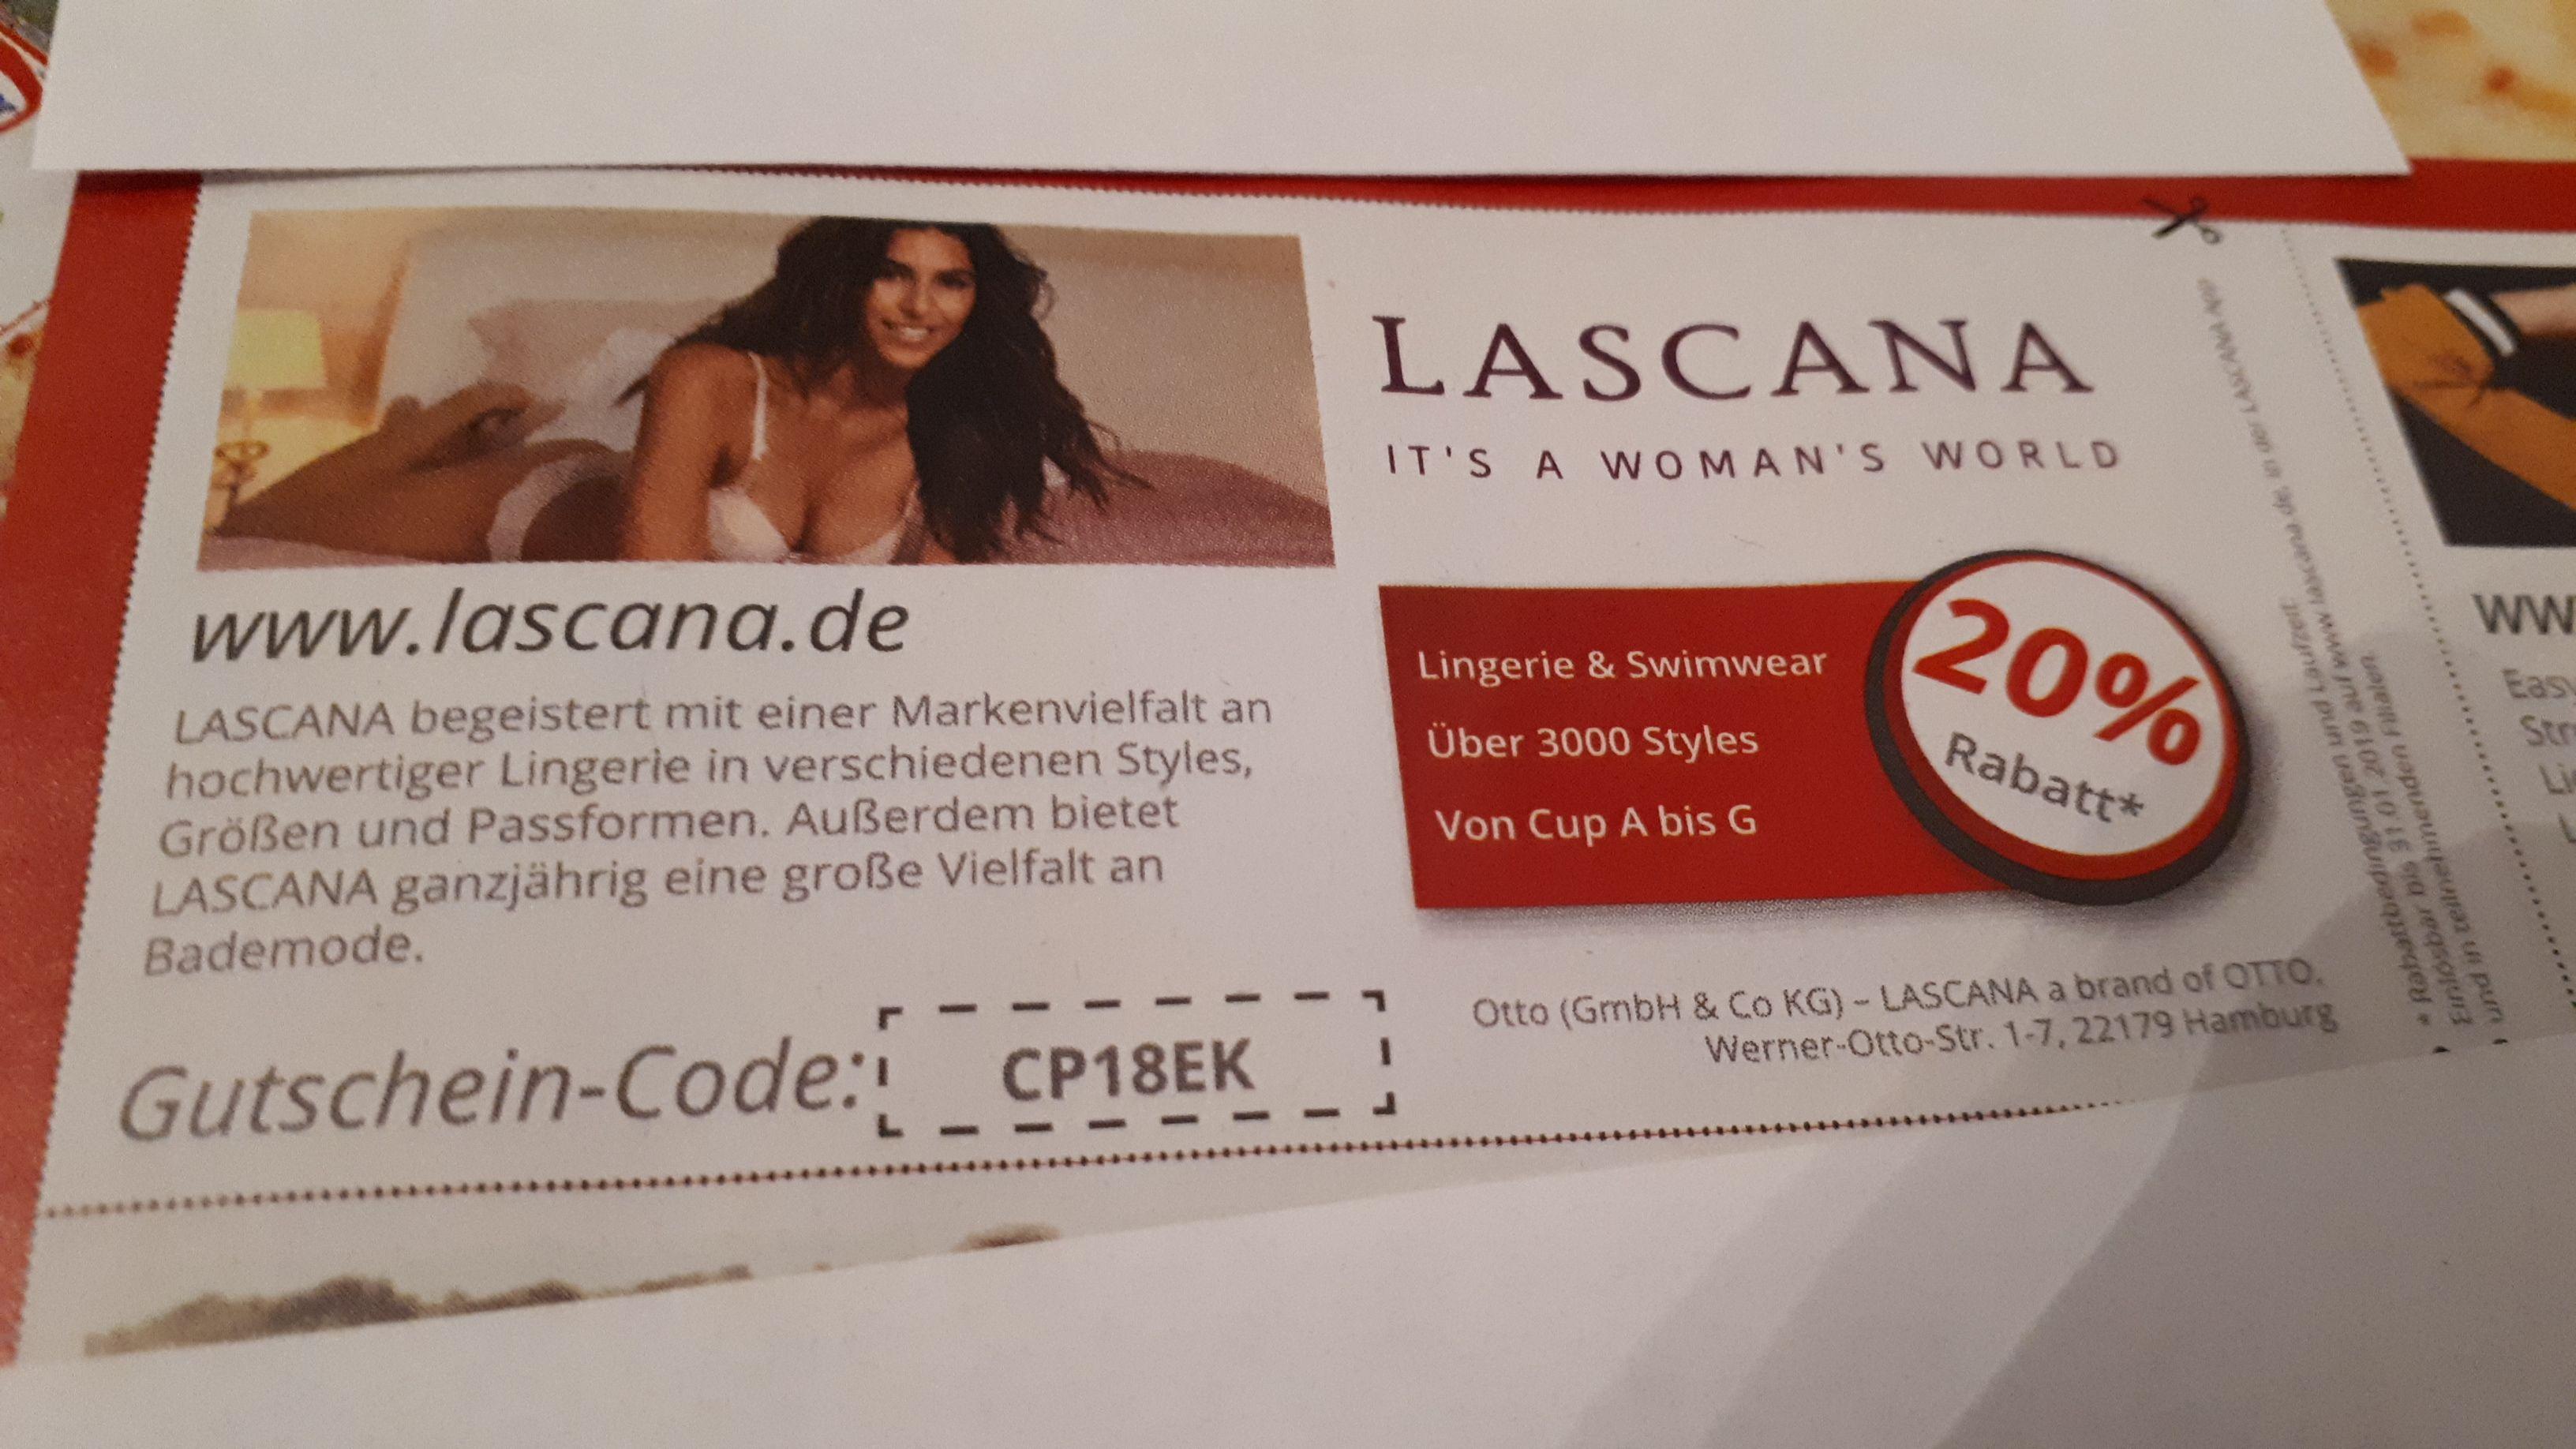 Lascana 20% Rabatt ohne MBW